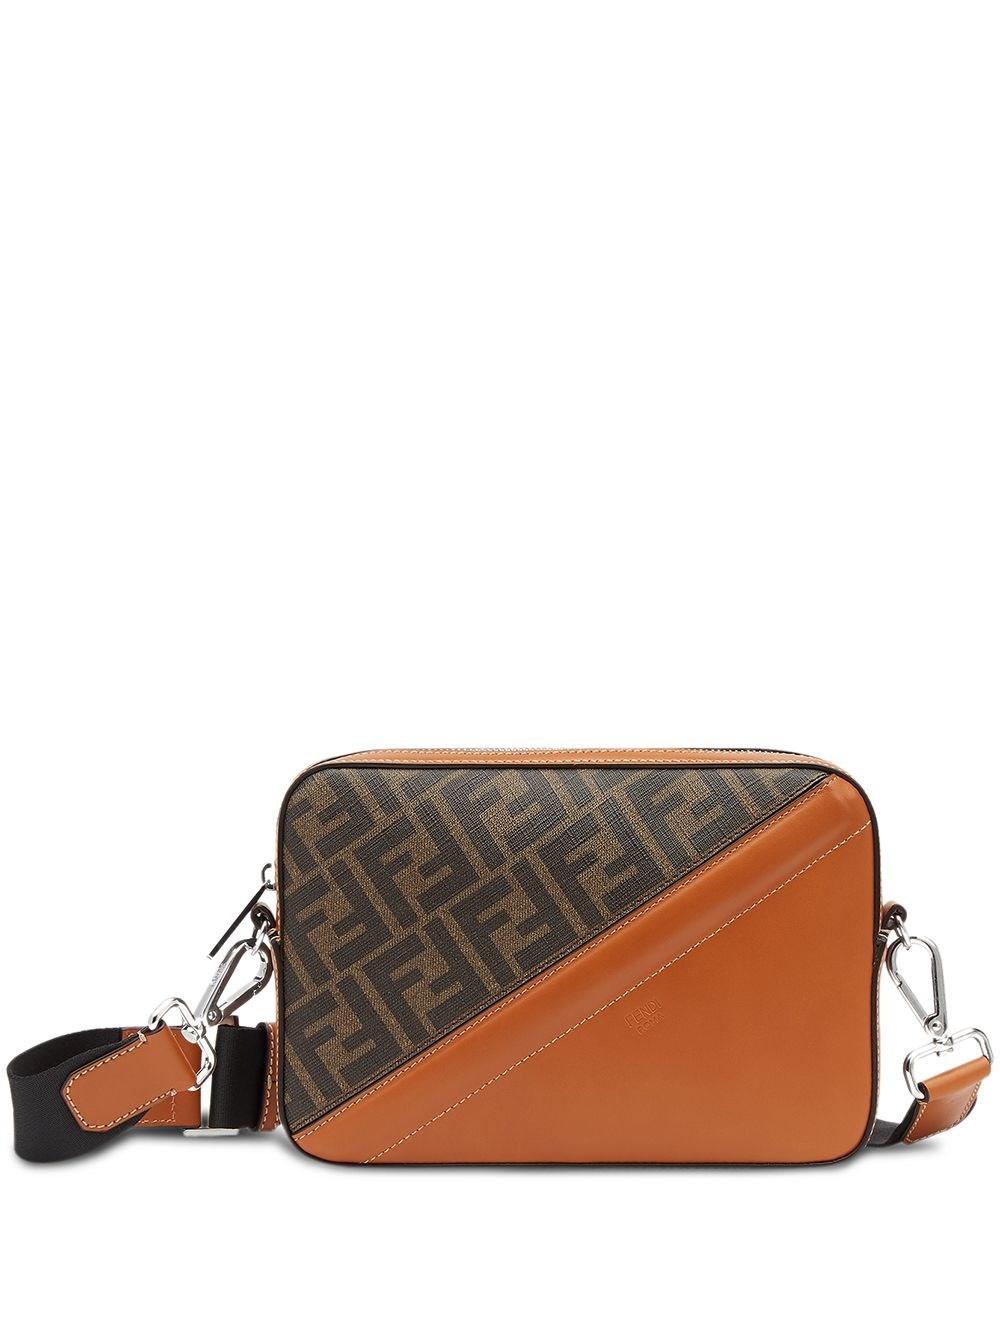 Fendi Leathers CAMERA BAG